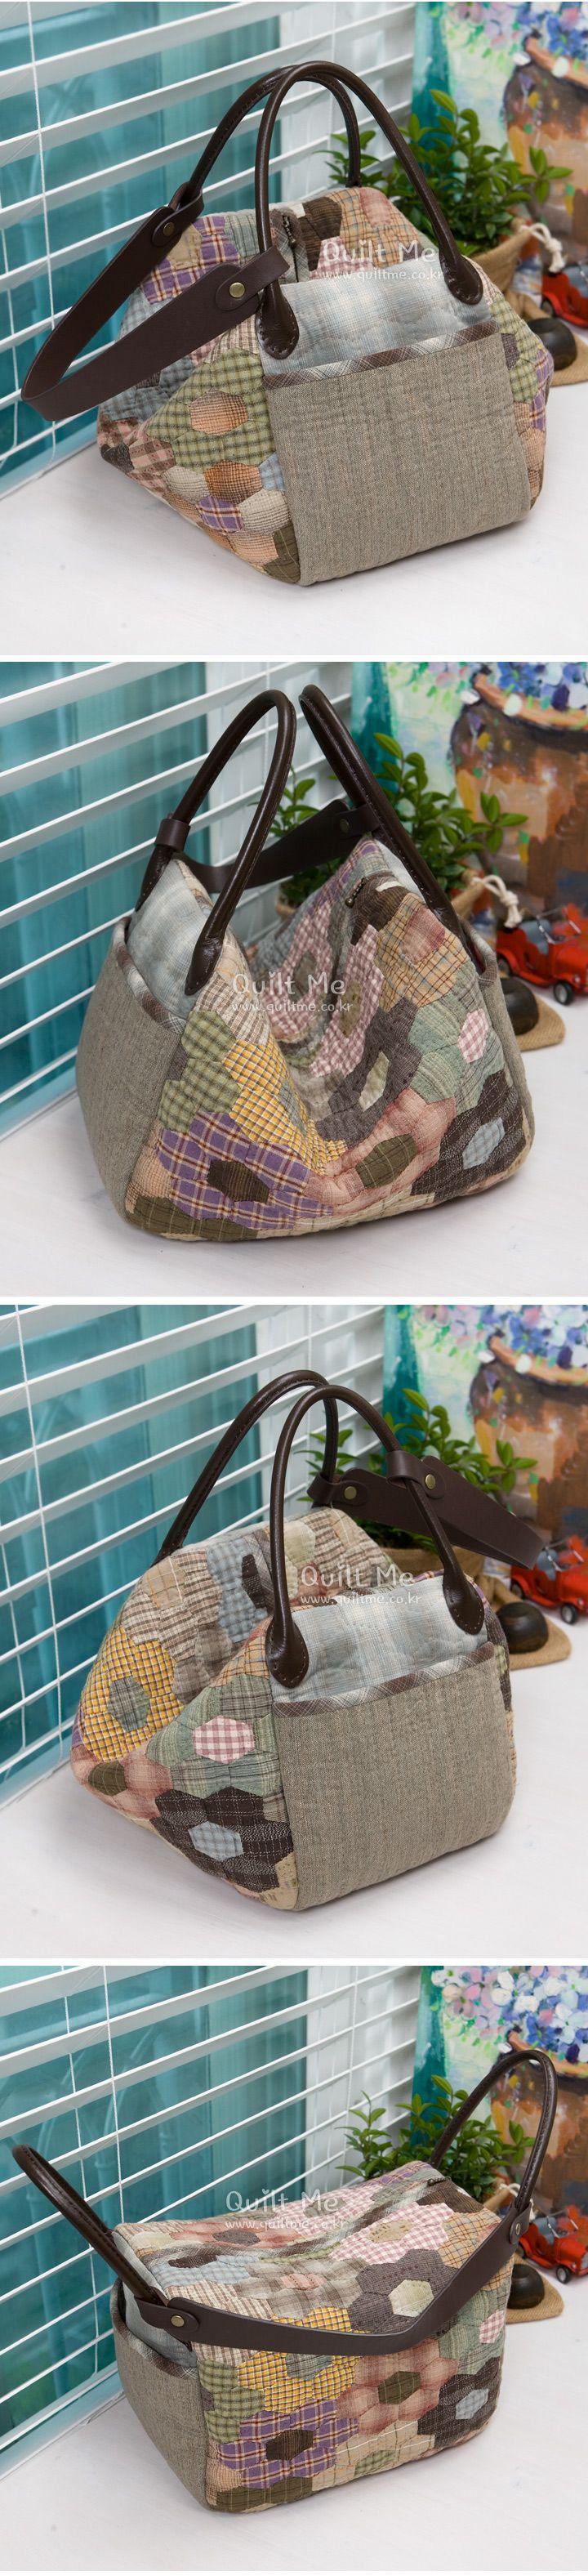 Americana del edredón - Hexágono múltiples parche manejar bolsa; Medidas: Ancho 30cm, Vertical 20cm, lateral (parte inferior) 18,5 cm *